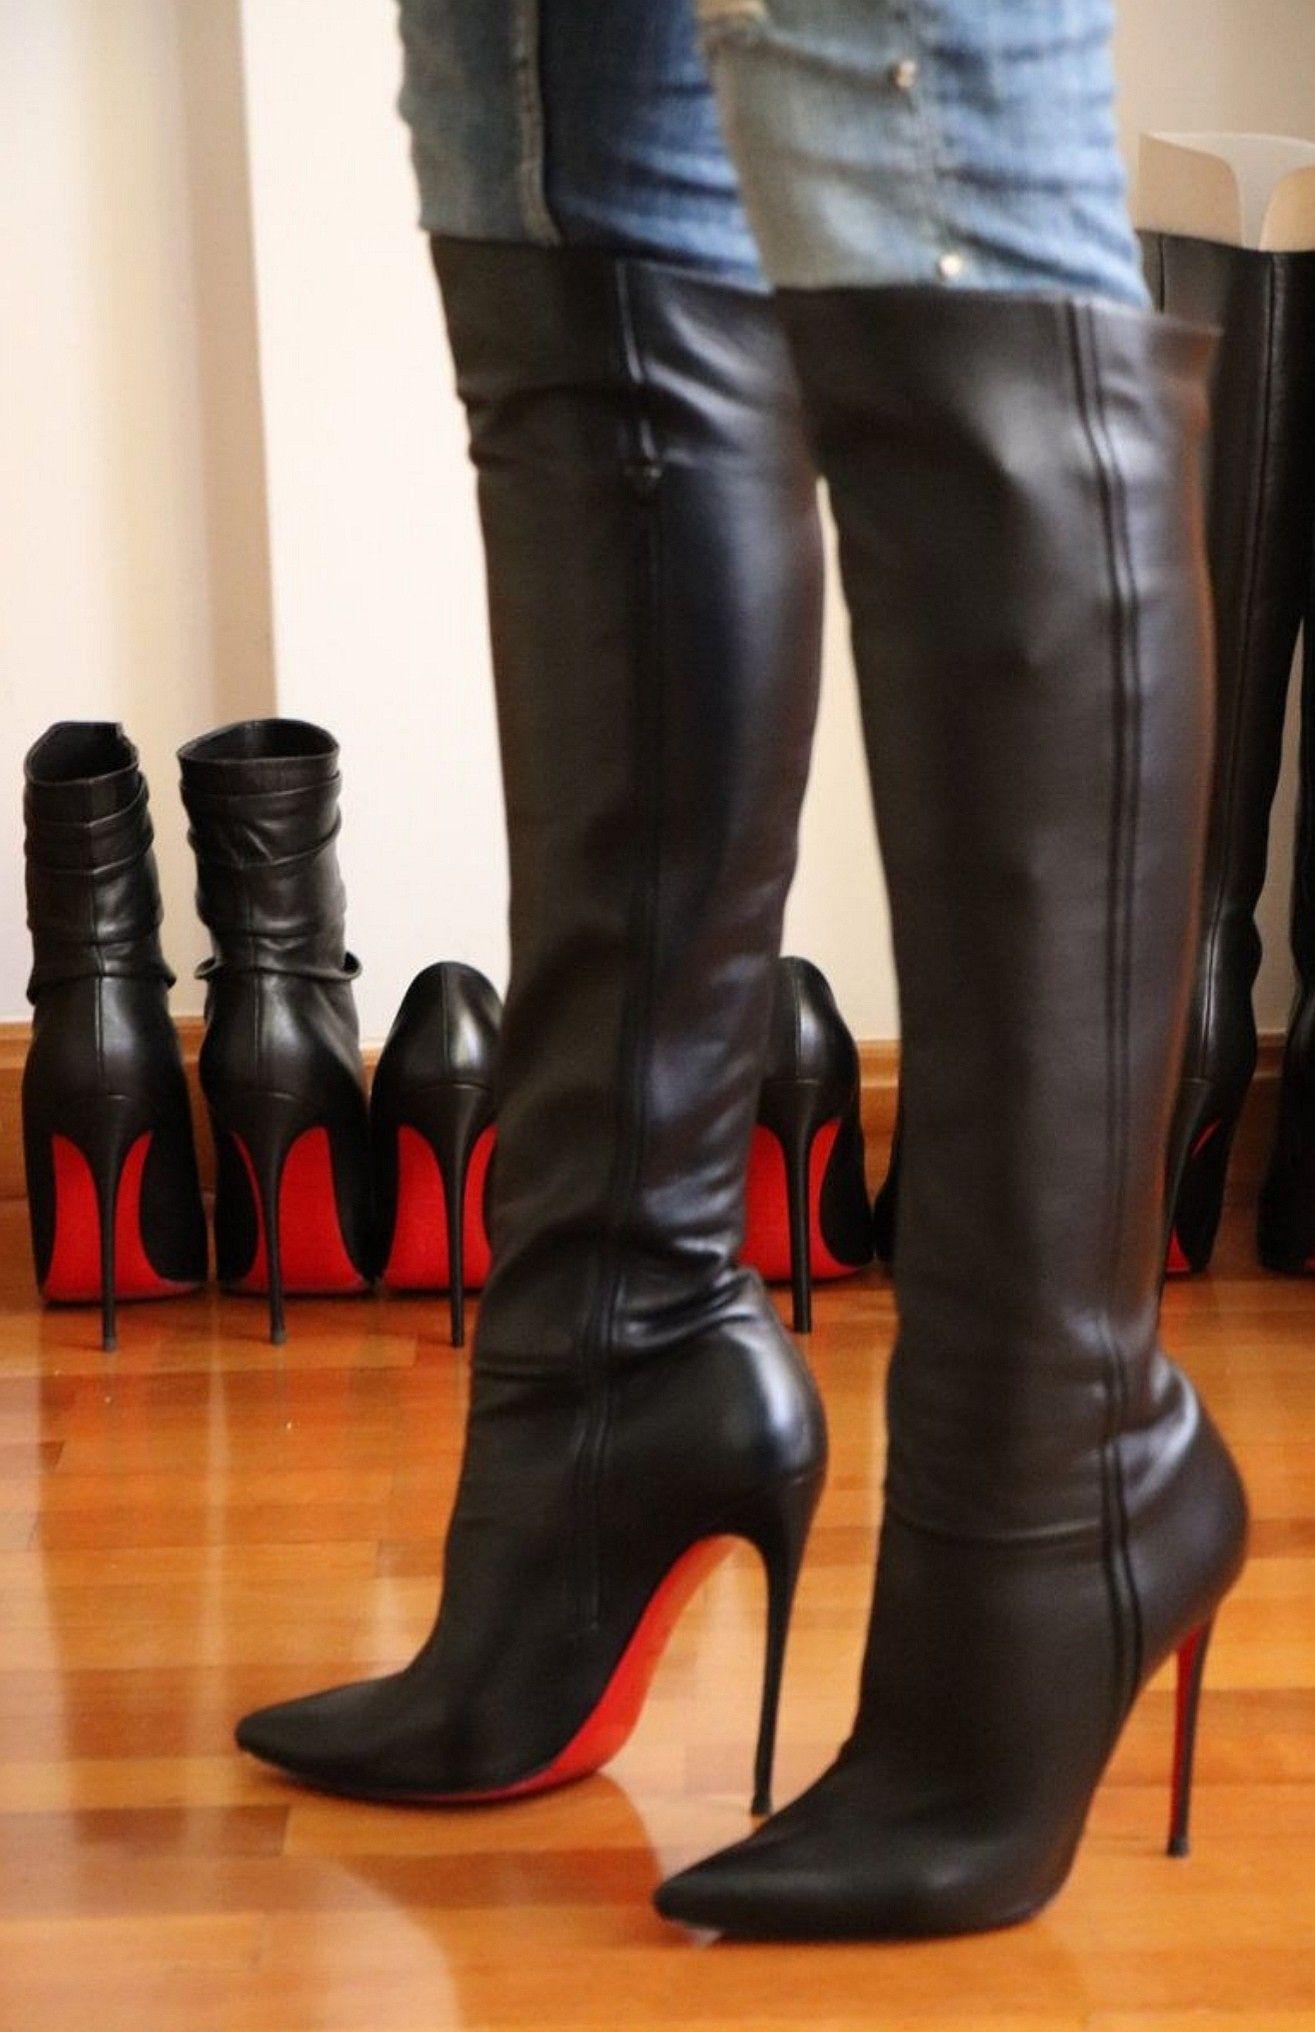 Pin af Skovhulen på Lange støvler   Lange støvler, Støvler